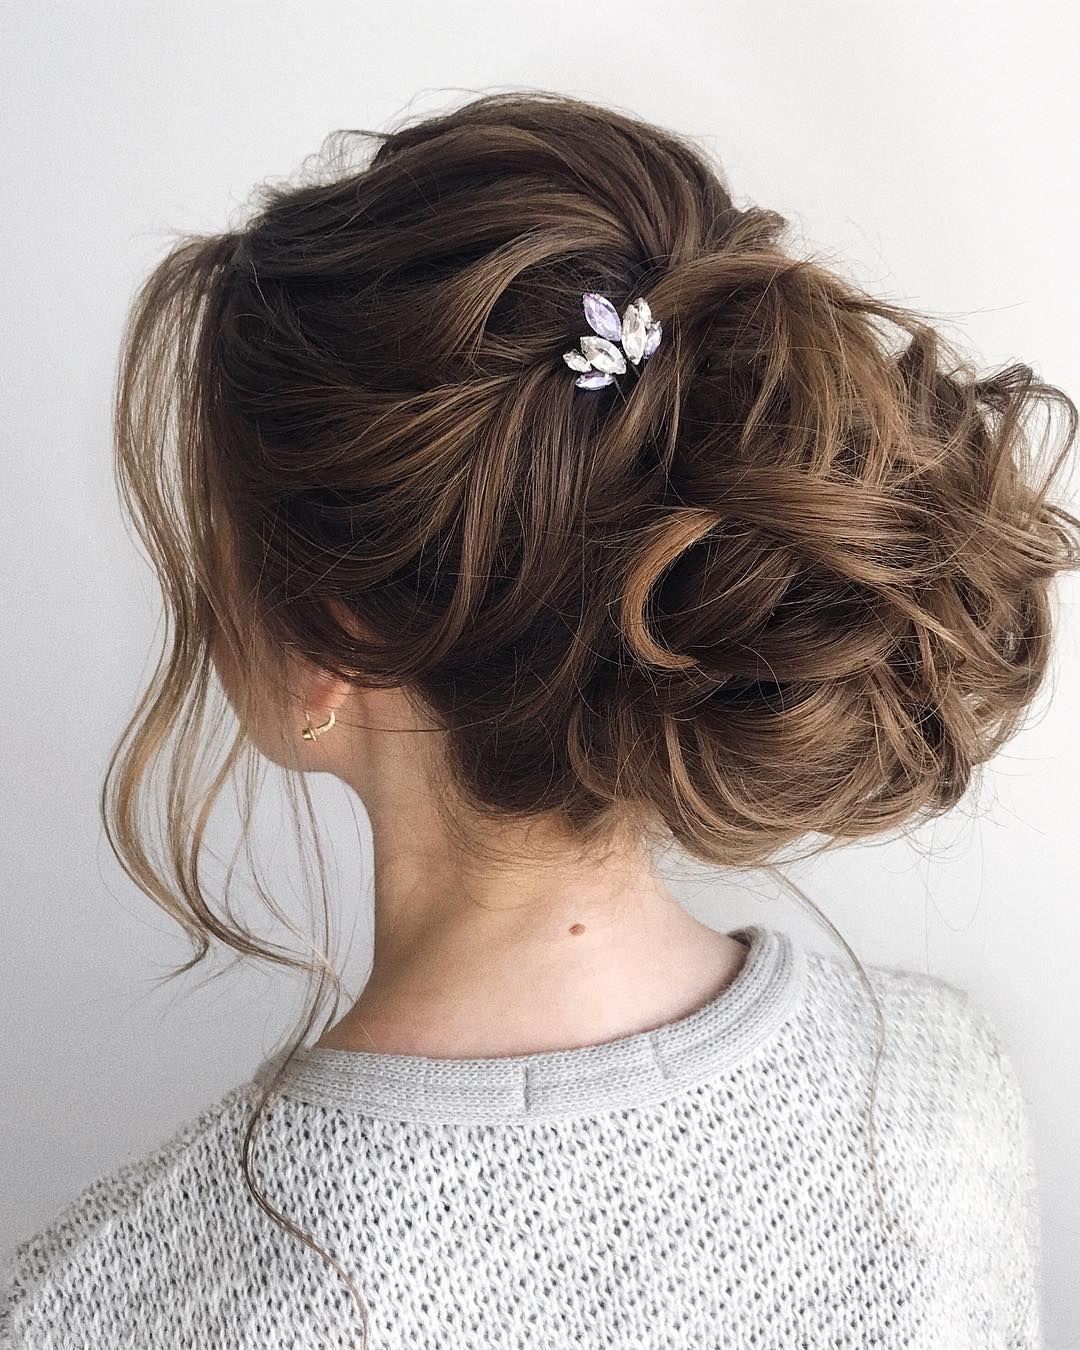 Hairstyle inspiration braid hairstyles updobraided updo wedding